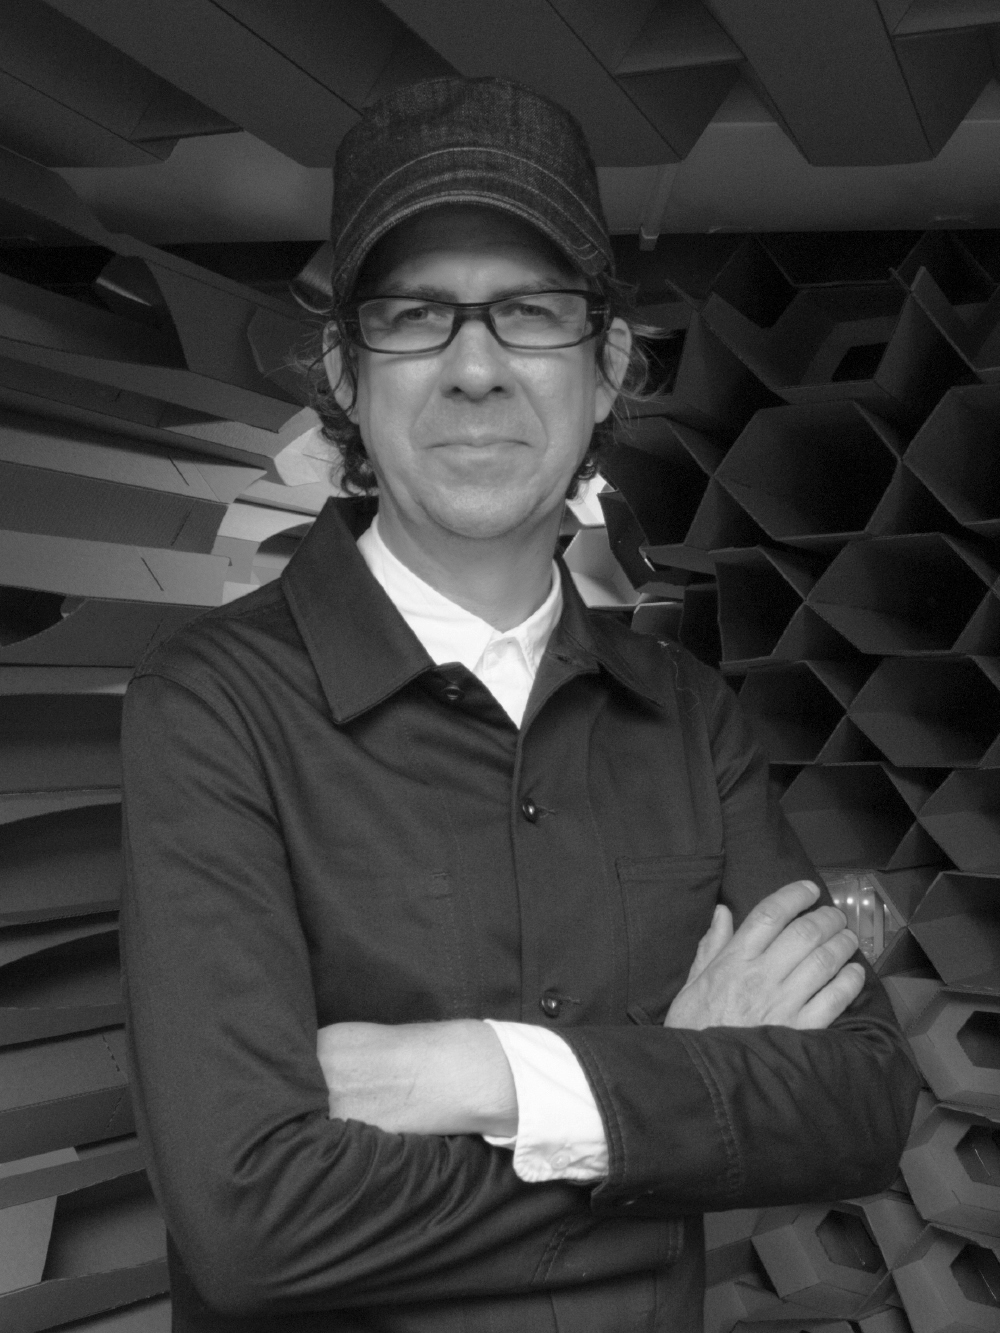 Christopher Kaltenbach